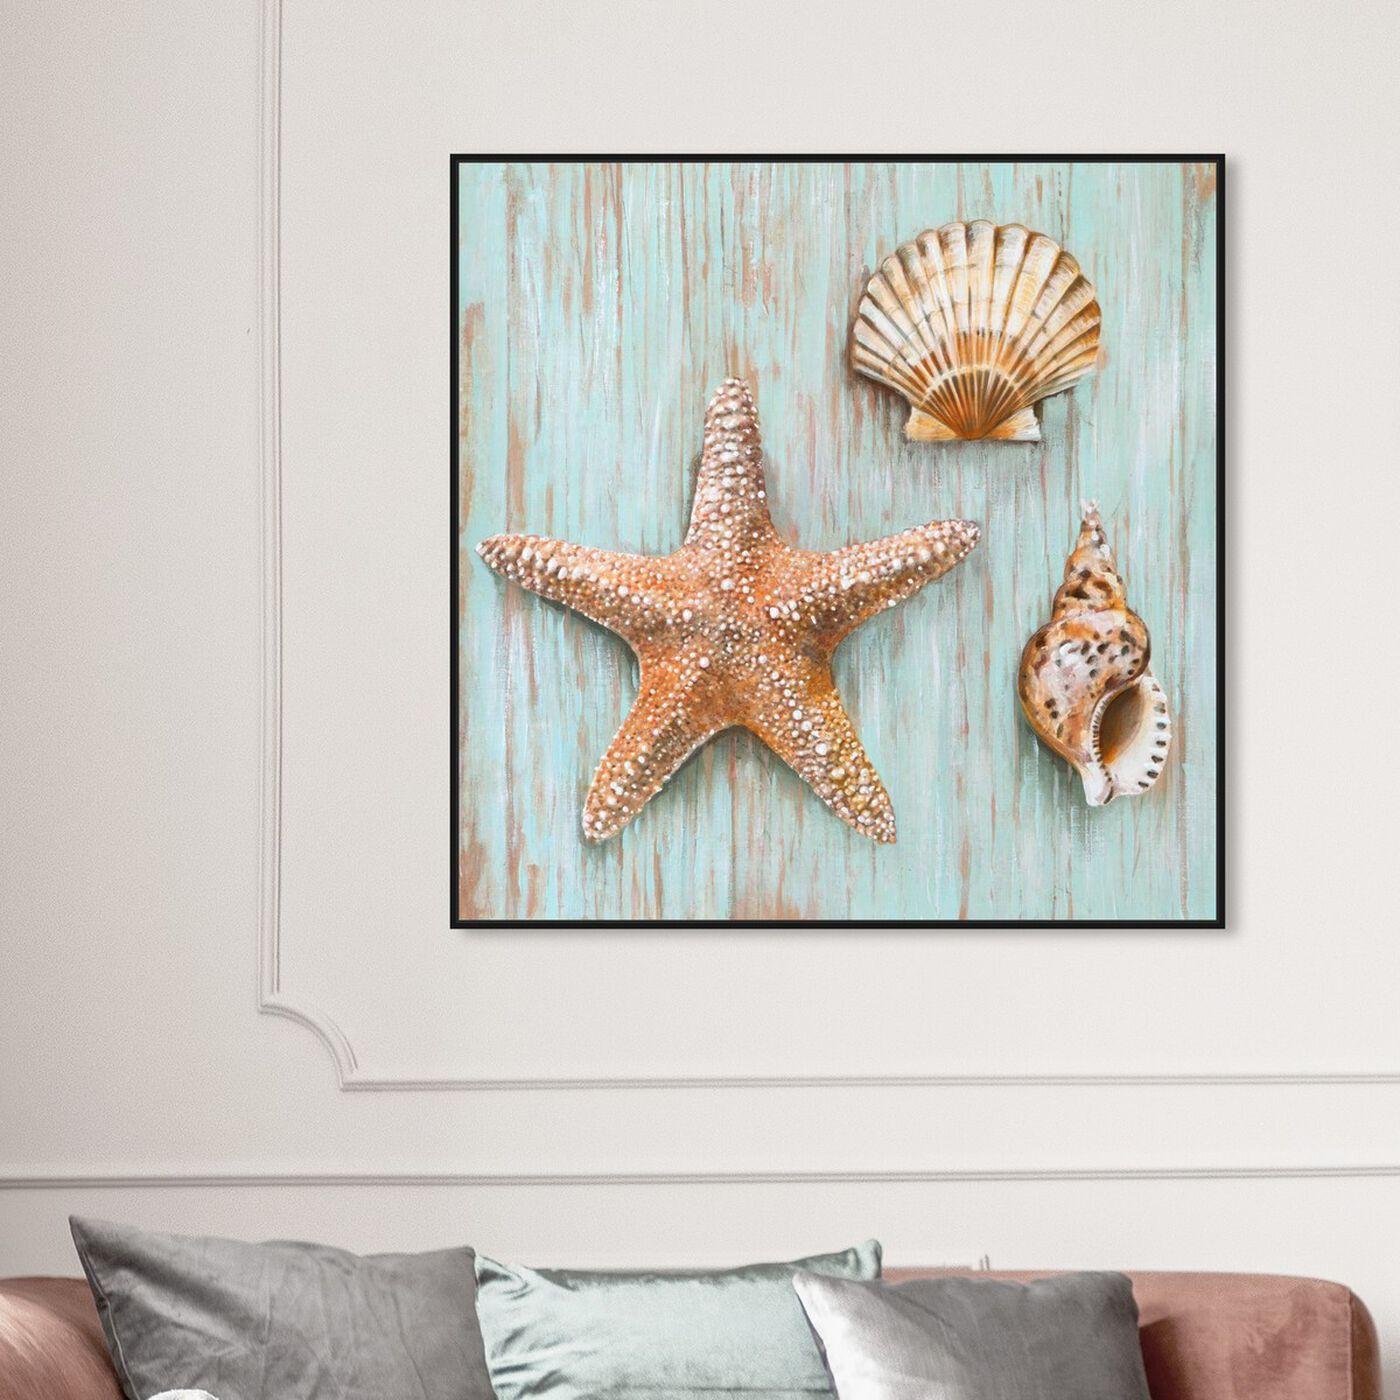 Hanging view of SAI - Maritimas Treasures featuring nautical and coastal and marine life art.